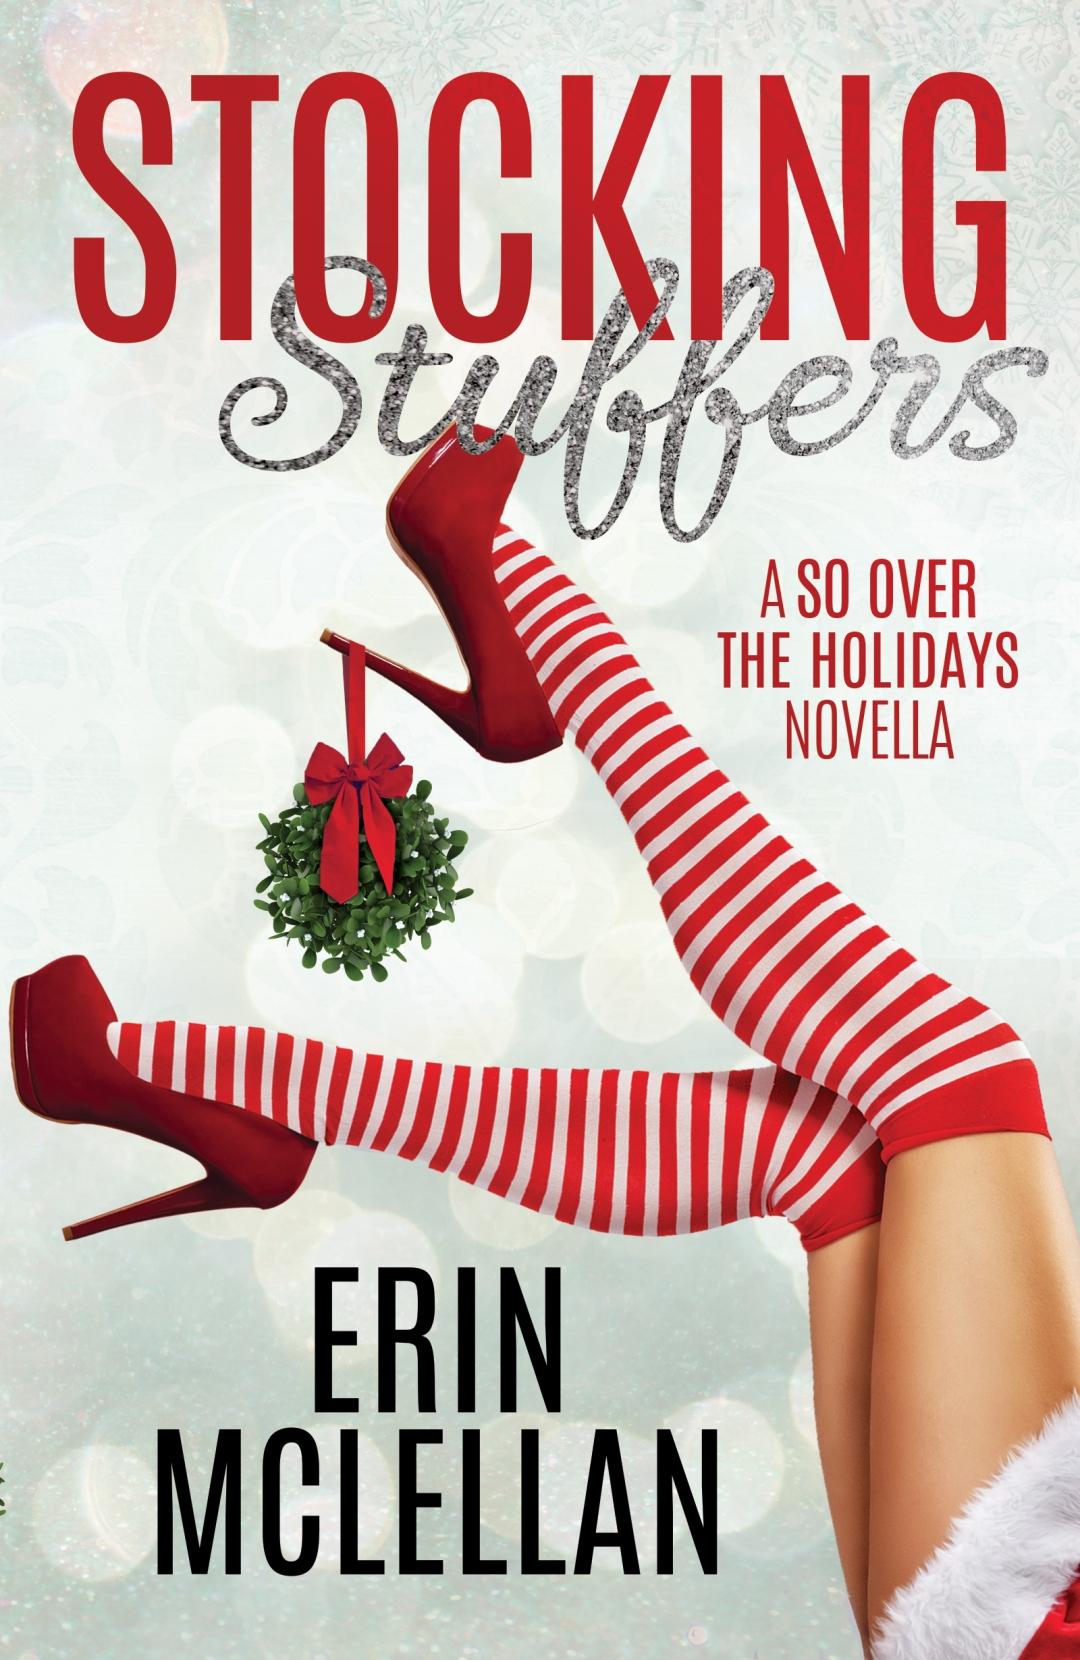 stocking-stuffers-ebook.jpg